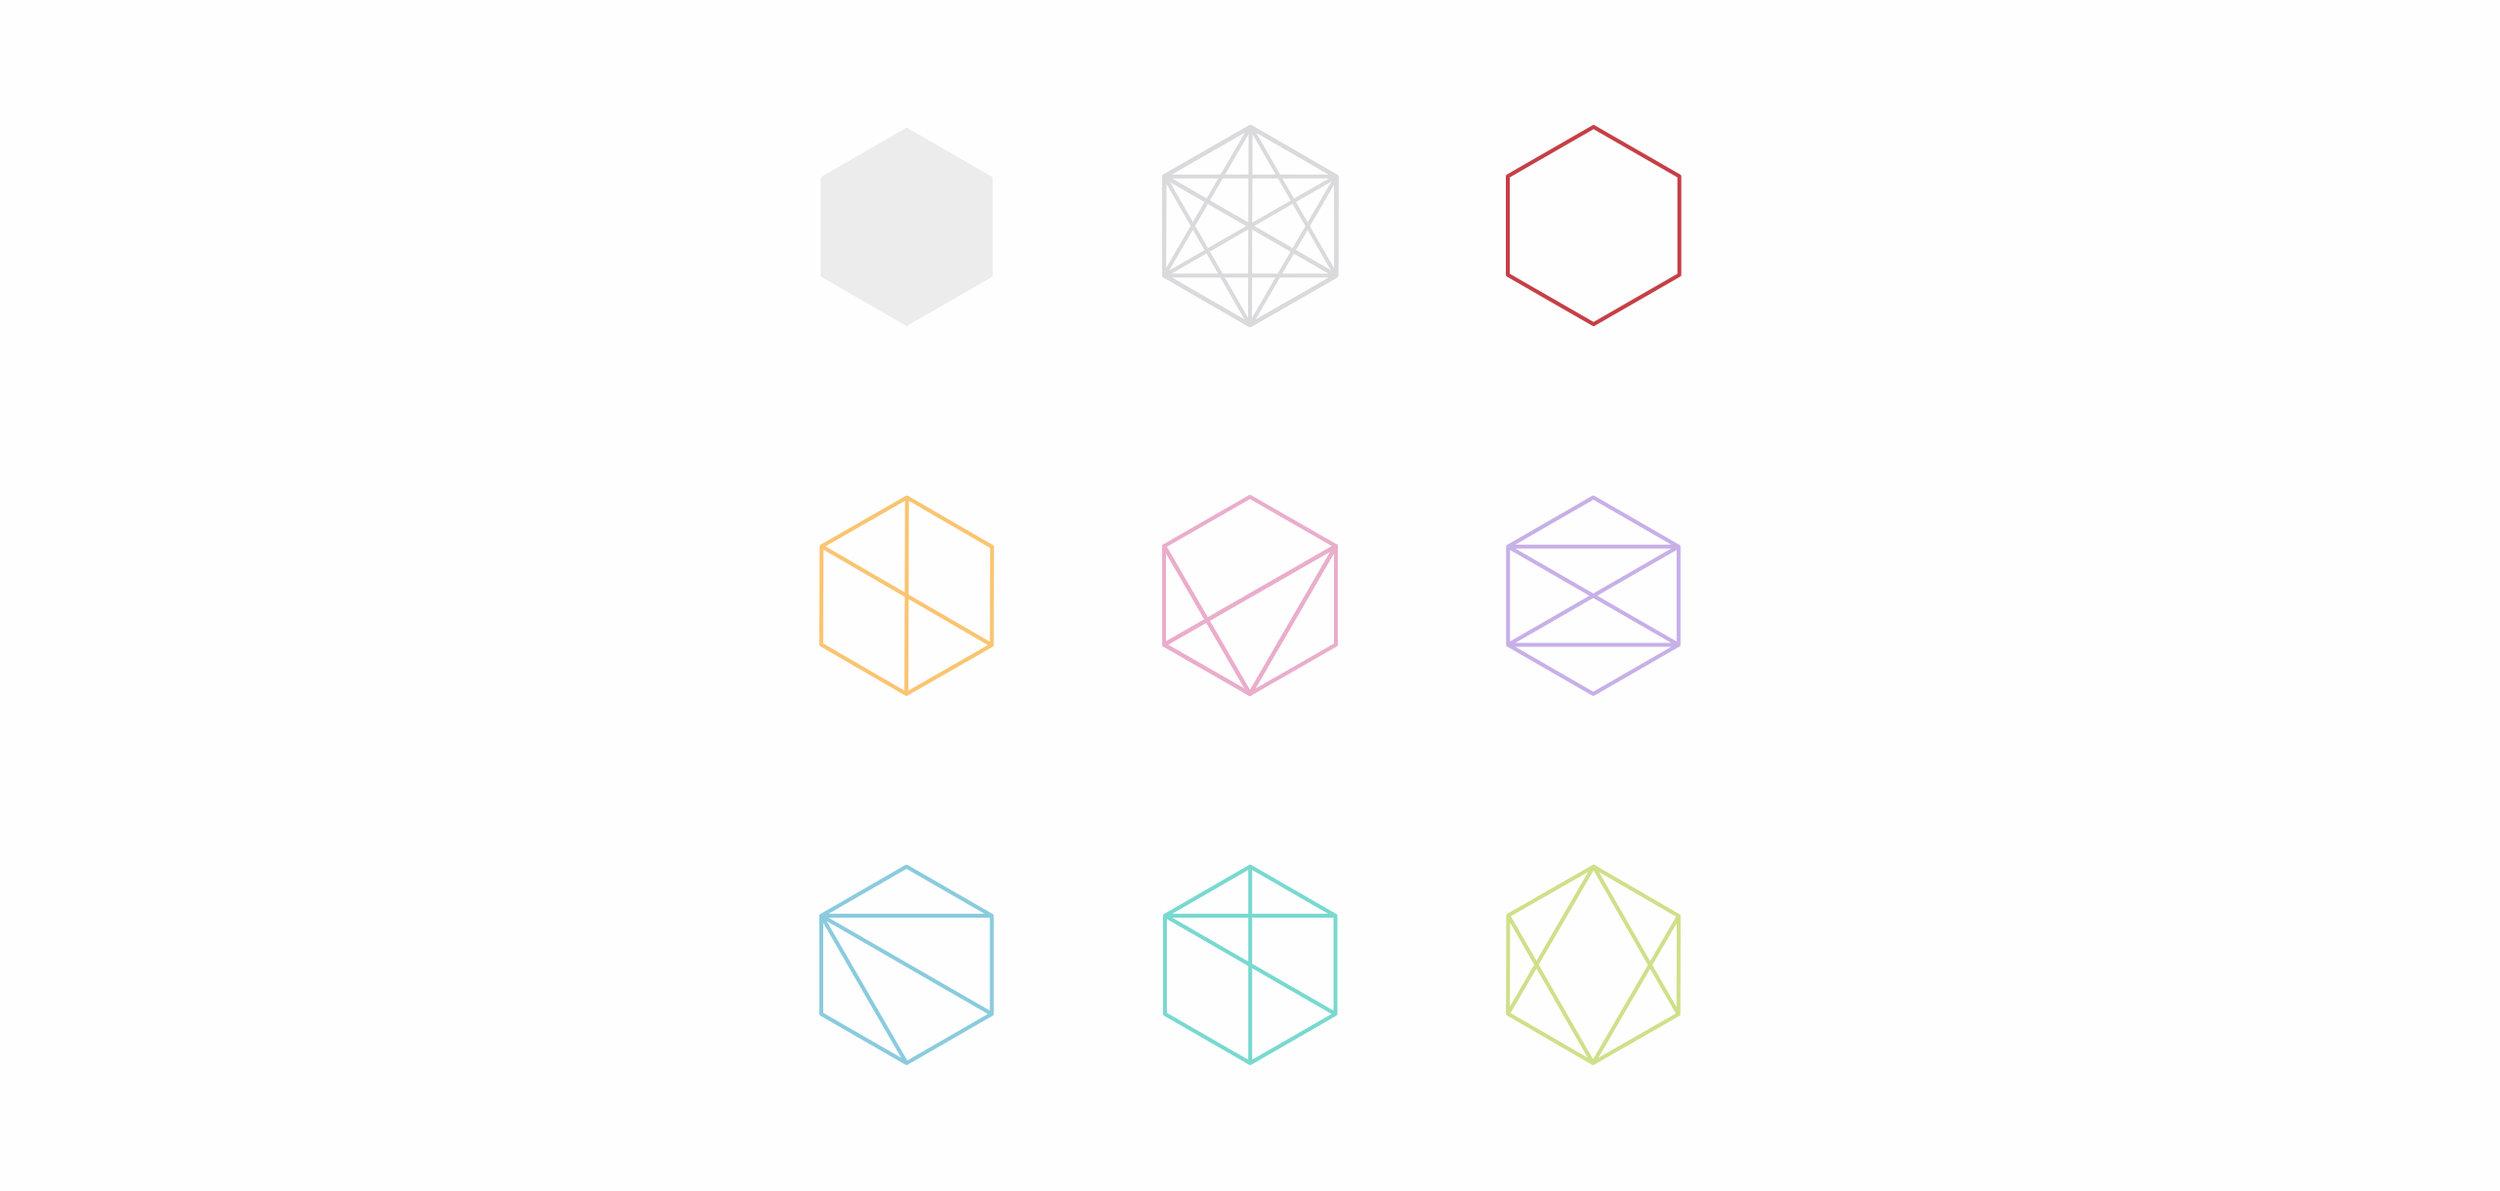 emds_brand-patterns-02@2x.jpg